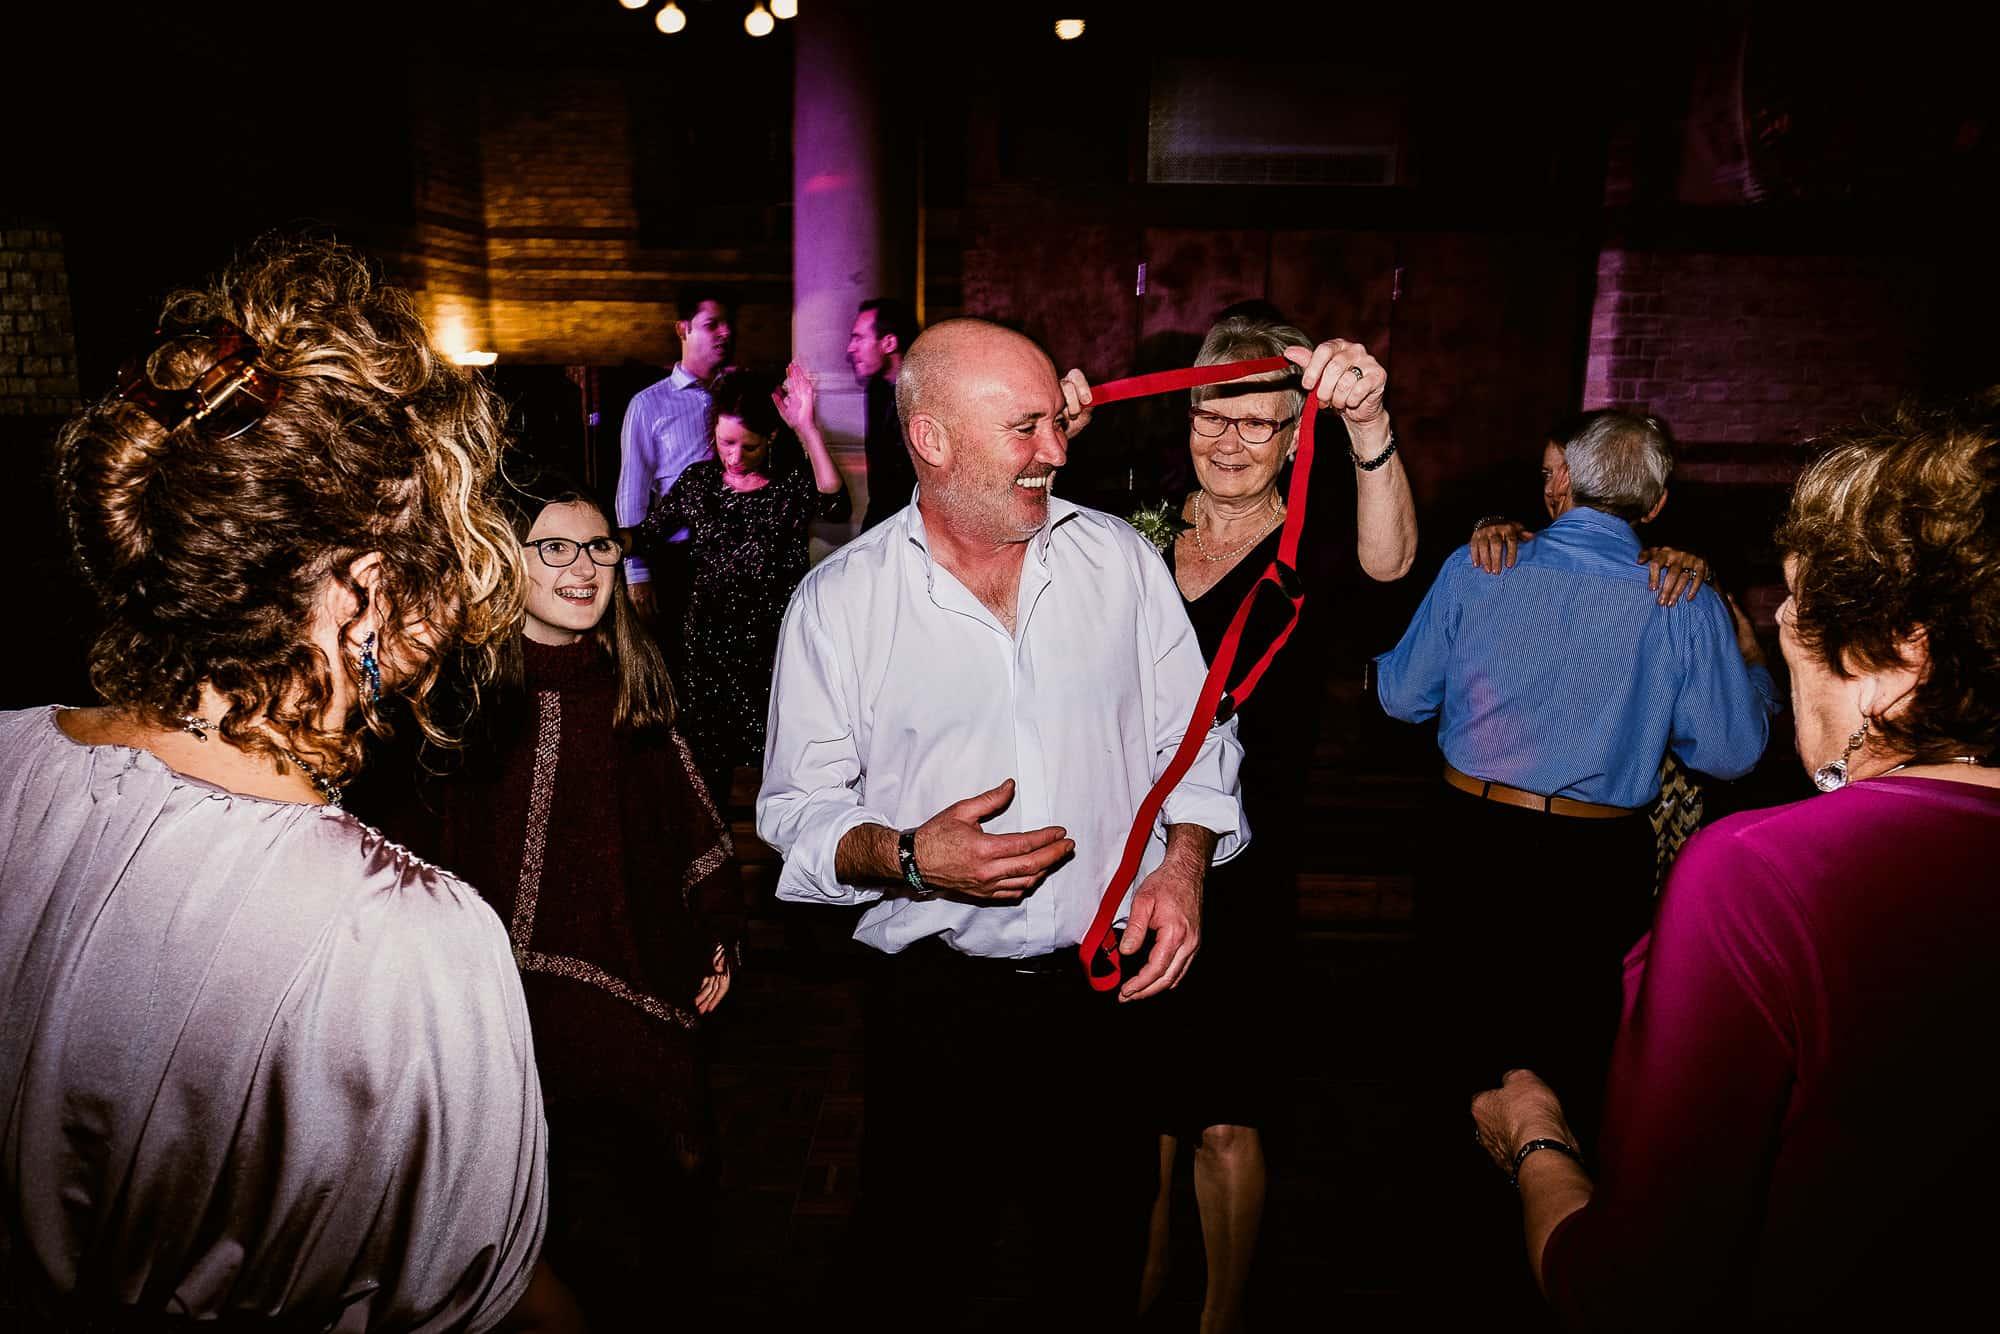 st-stephens-wedding-photographer-matt-tyler-0052